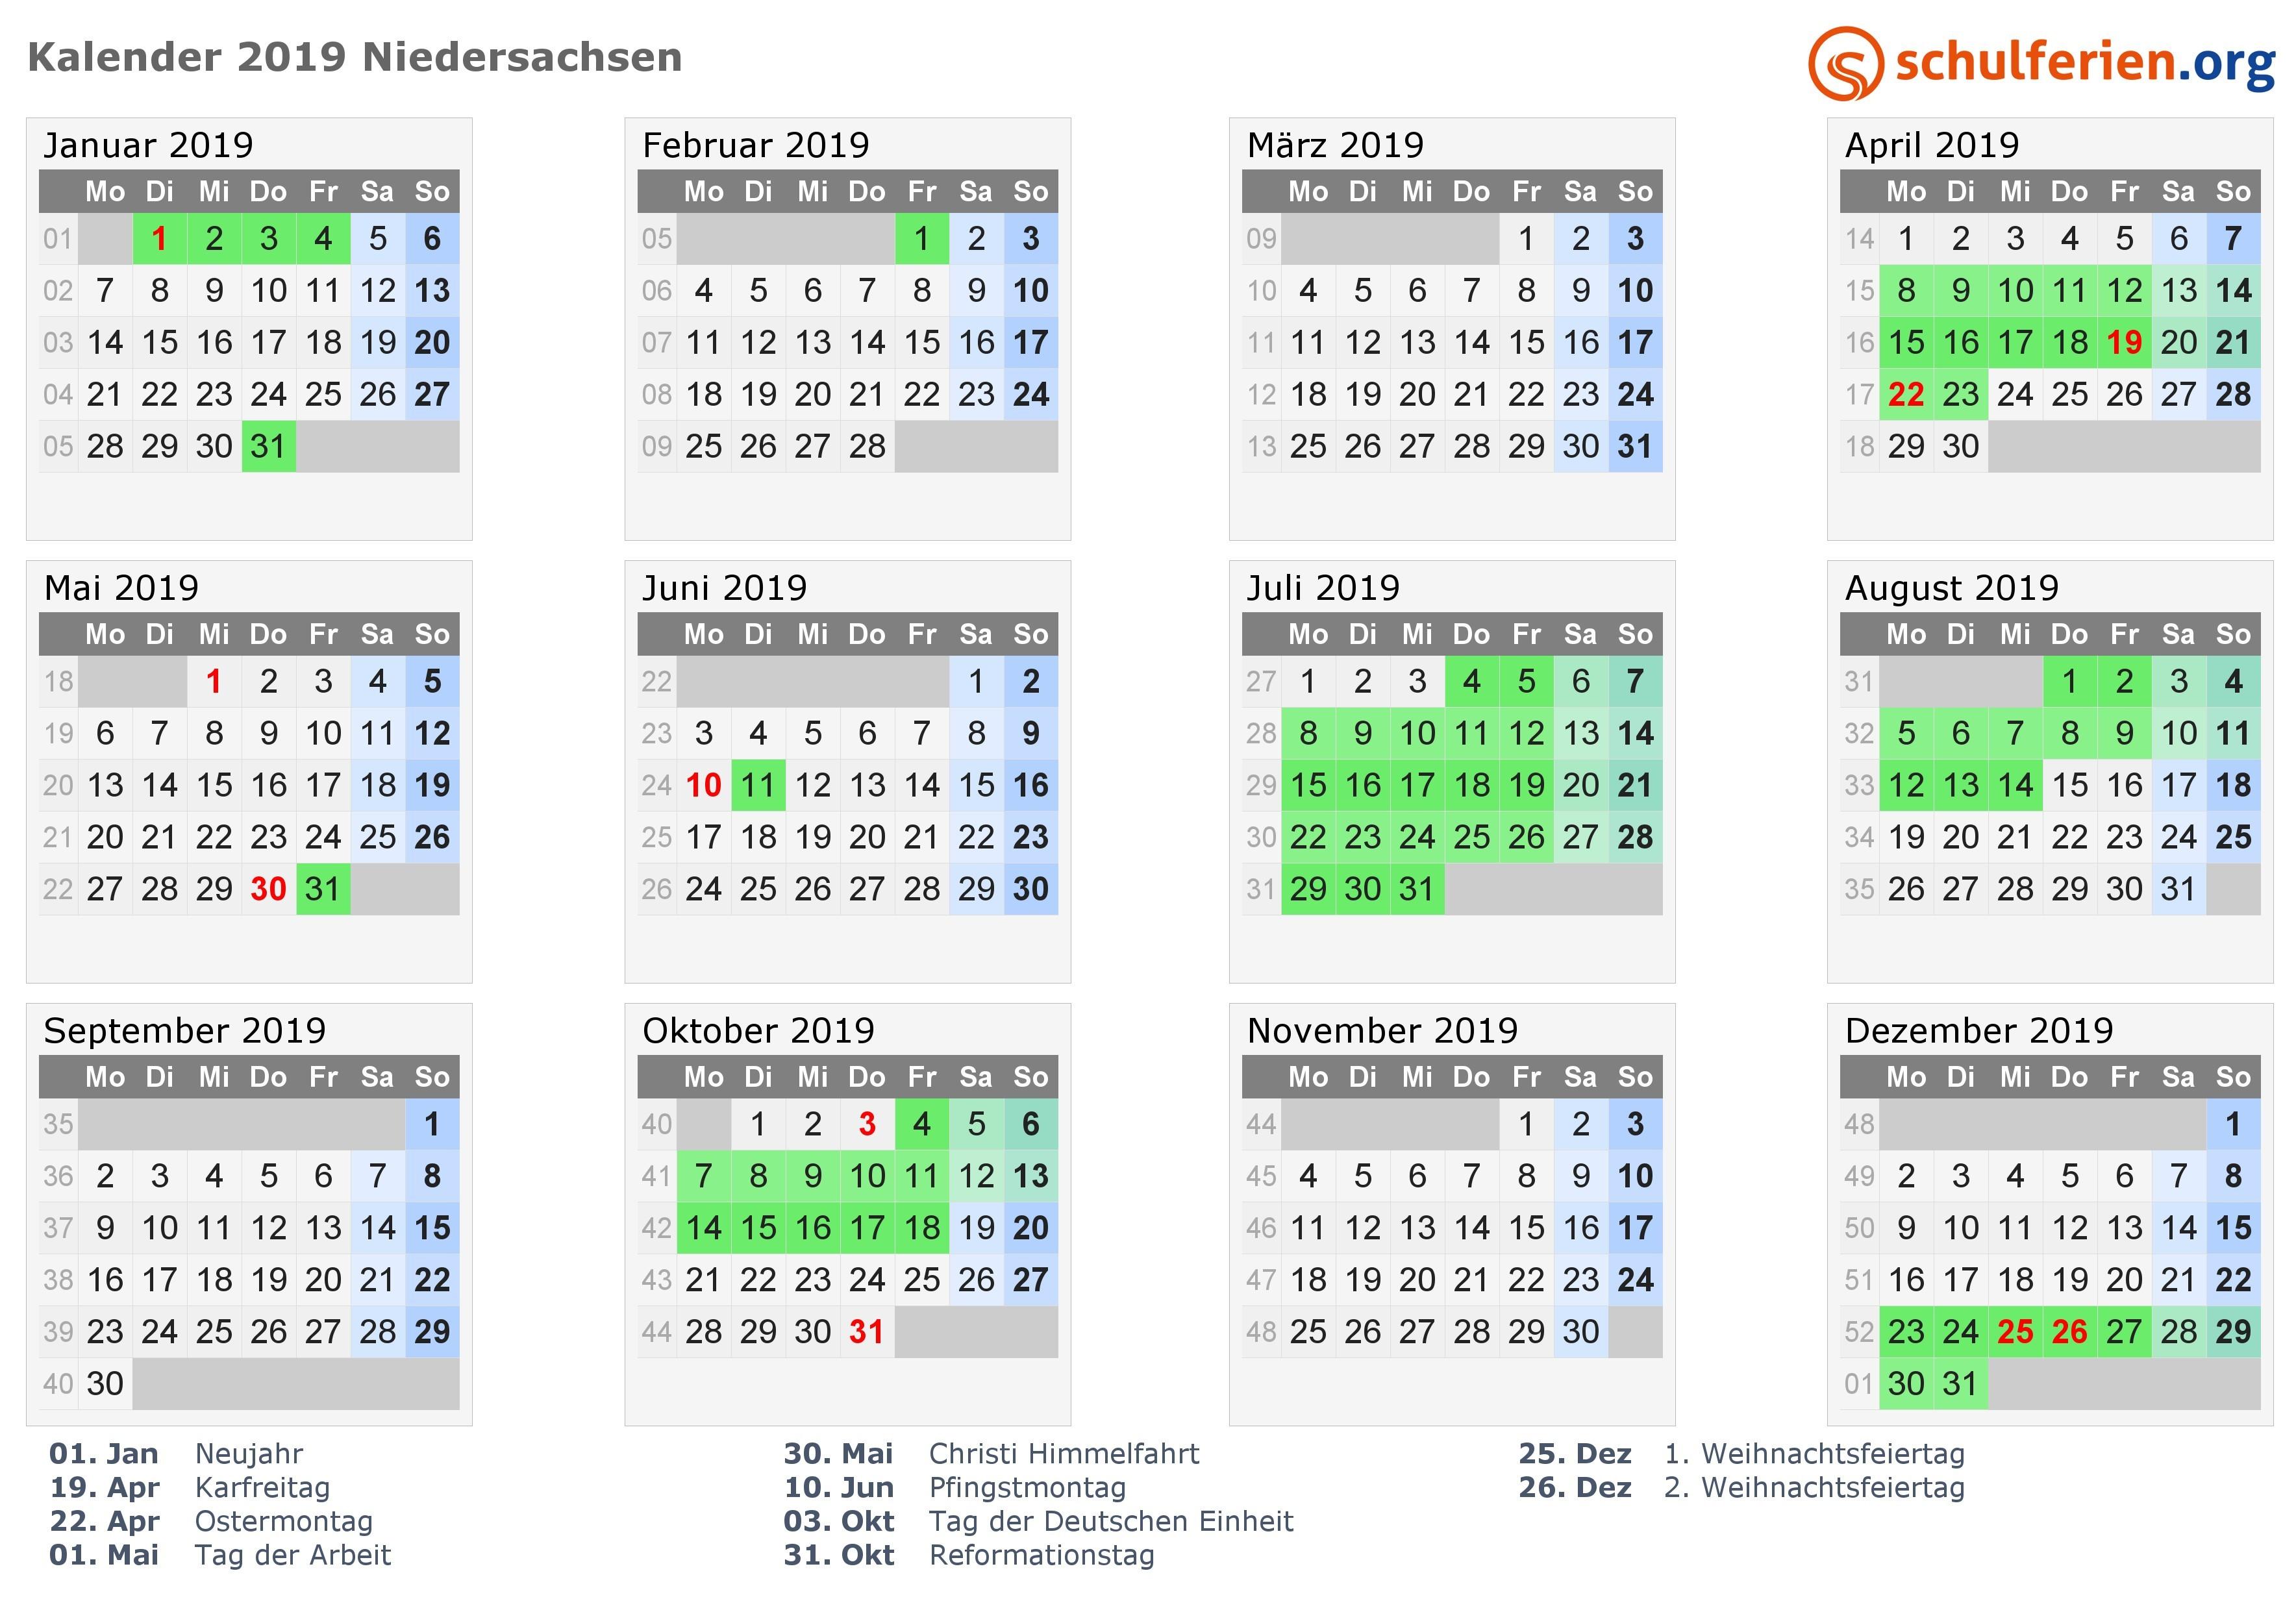 2019 Calendar Template Excel Uk Más Recientes Gemischtes Bild Kalender 2019 Excel Of 2019 Calendar Template Excel Uk Más Recientes the Best Quality Illustration Your Chinese Calendar 2017 for